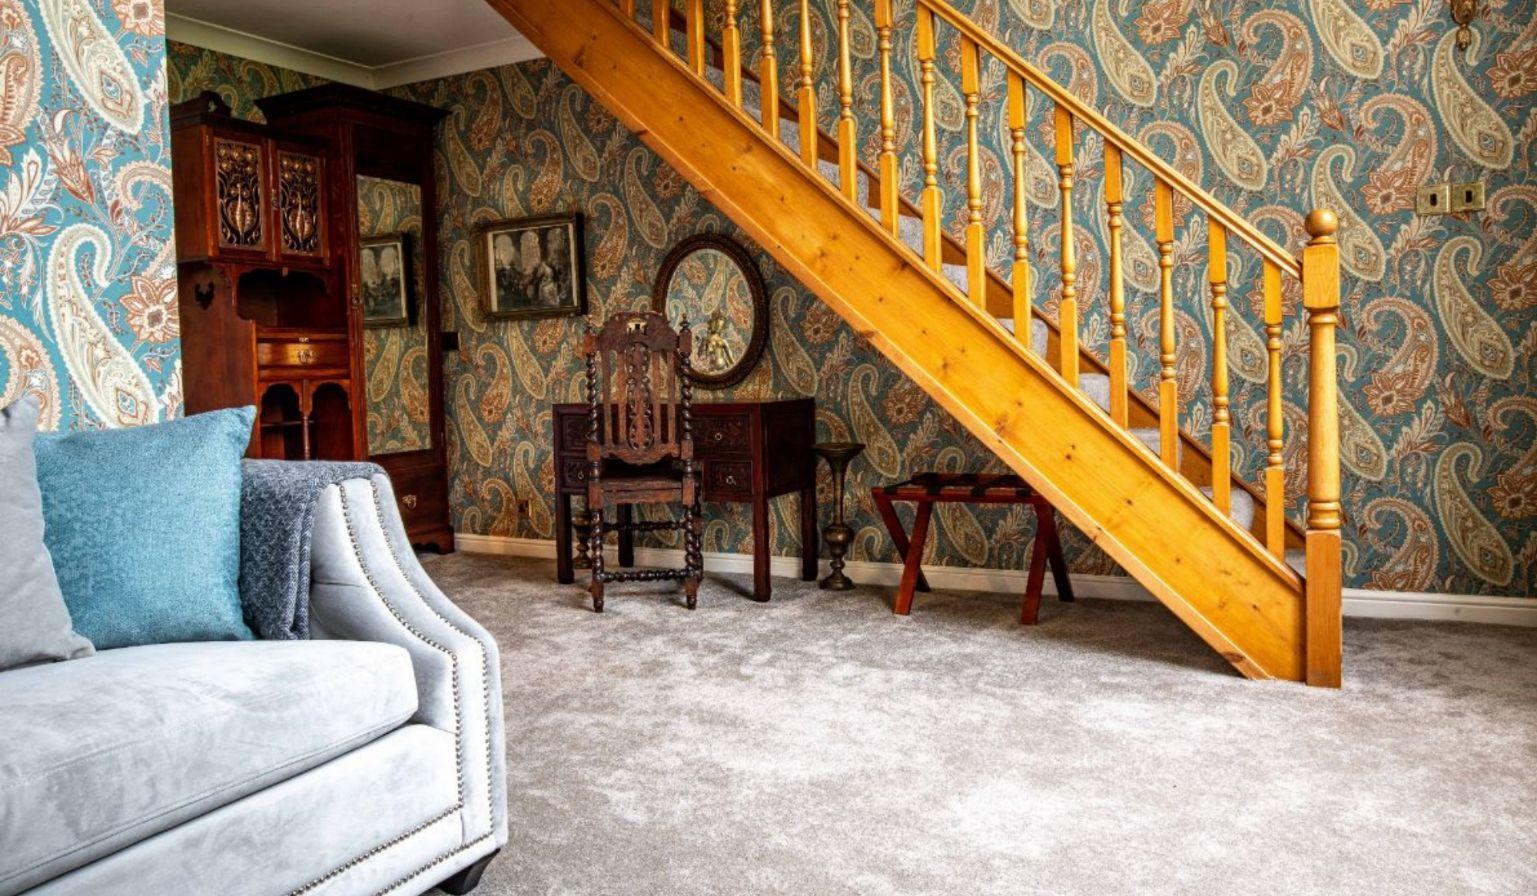 Junior Suite stairs to mezzanine level